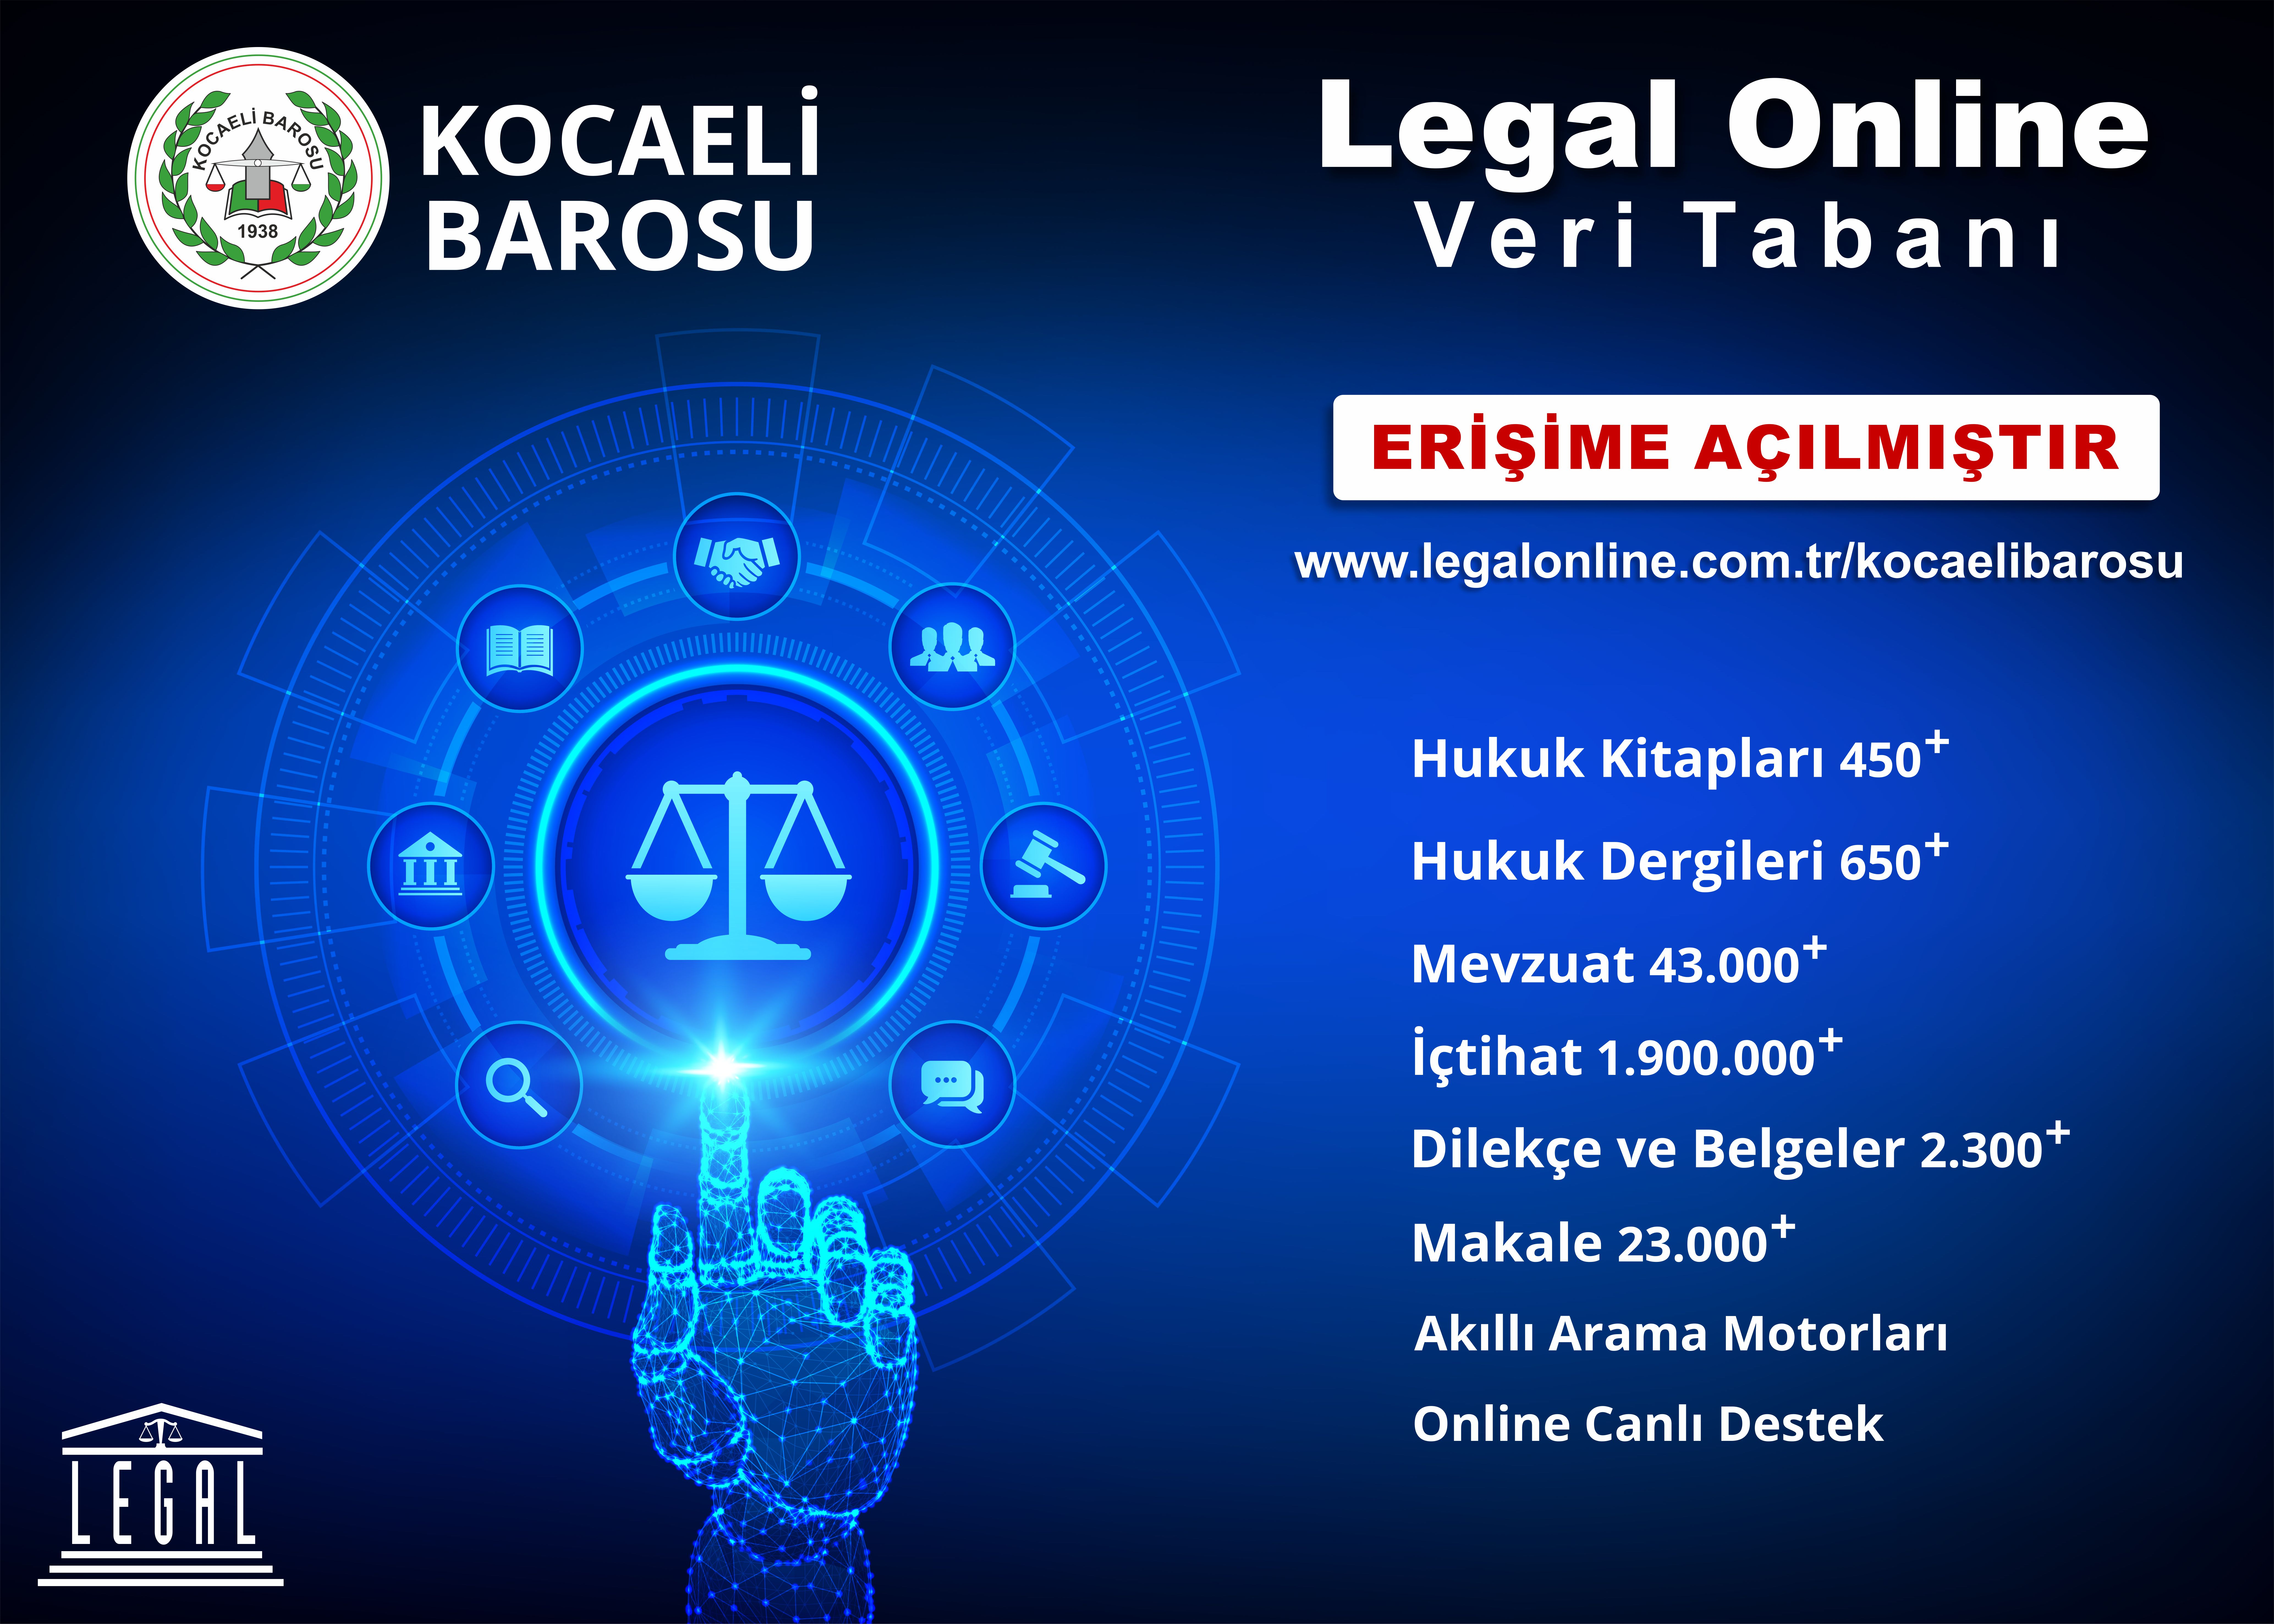 LEGAL ONLİNE VERİ TABANI